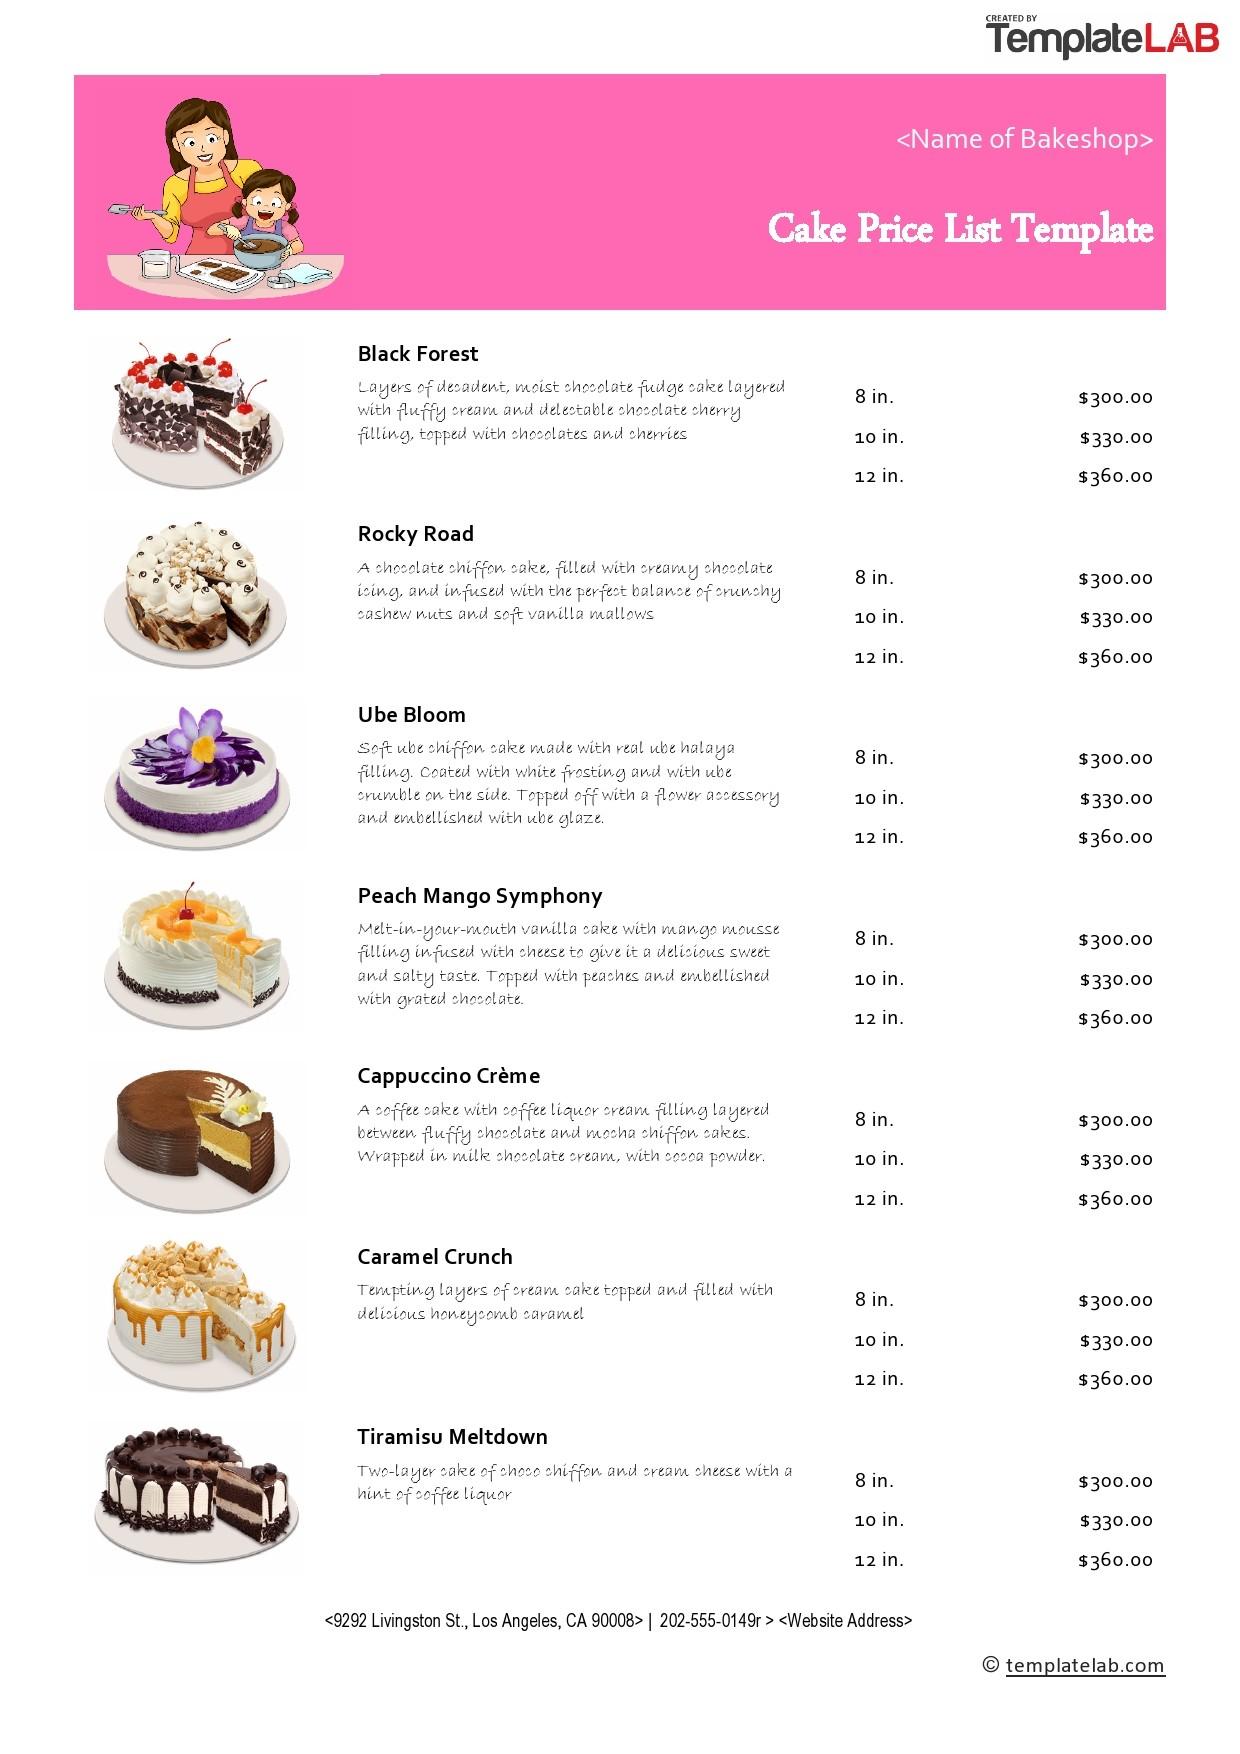 Free Cake Price List Template  - TemplateLab